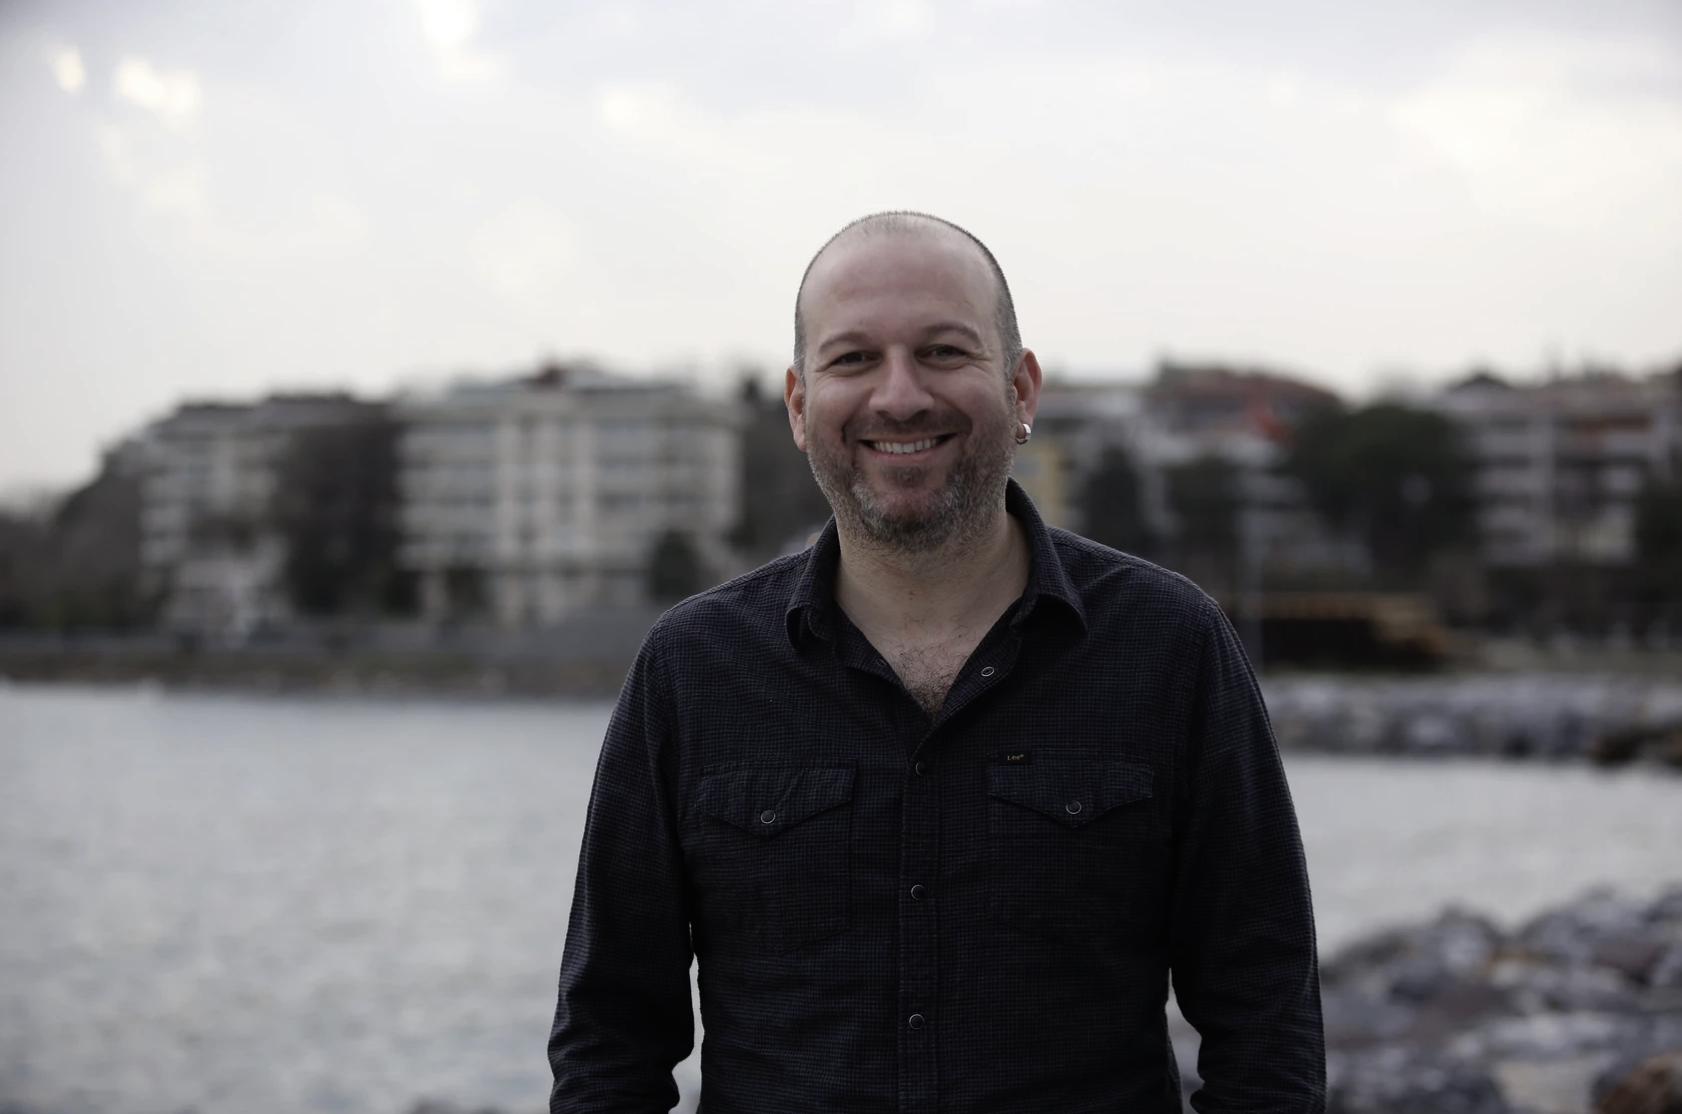 Turkish Drama: The Director's Vision